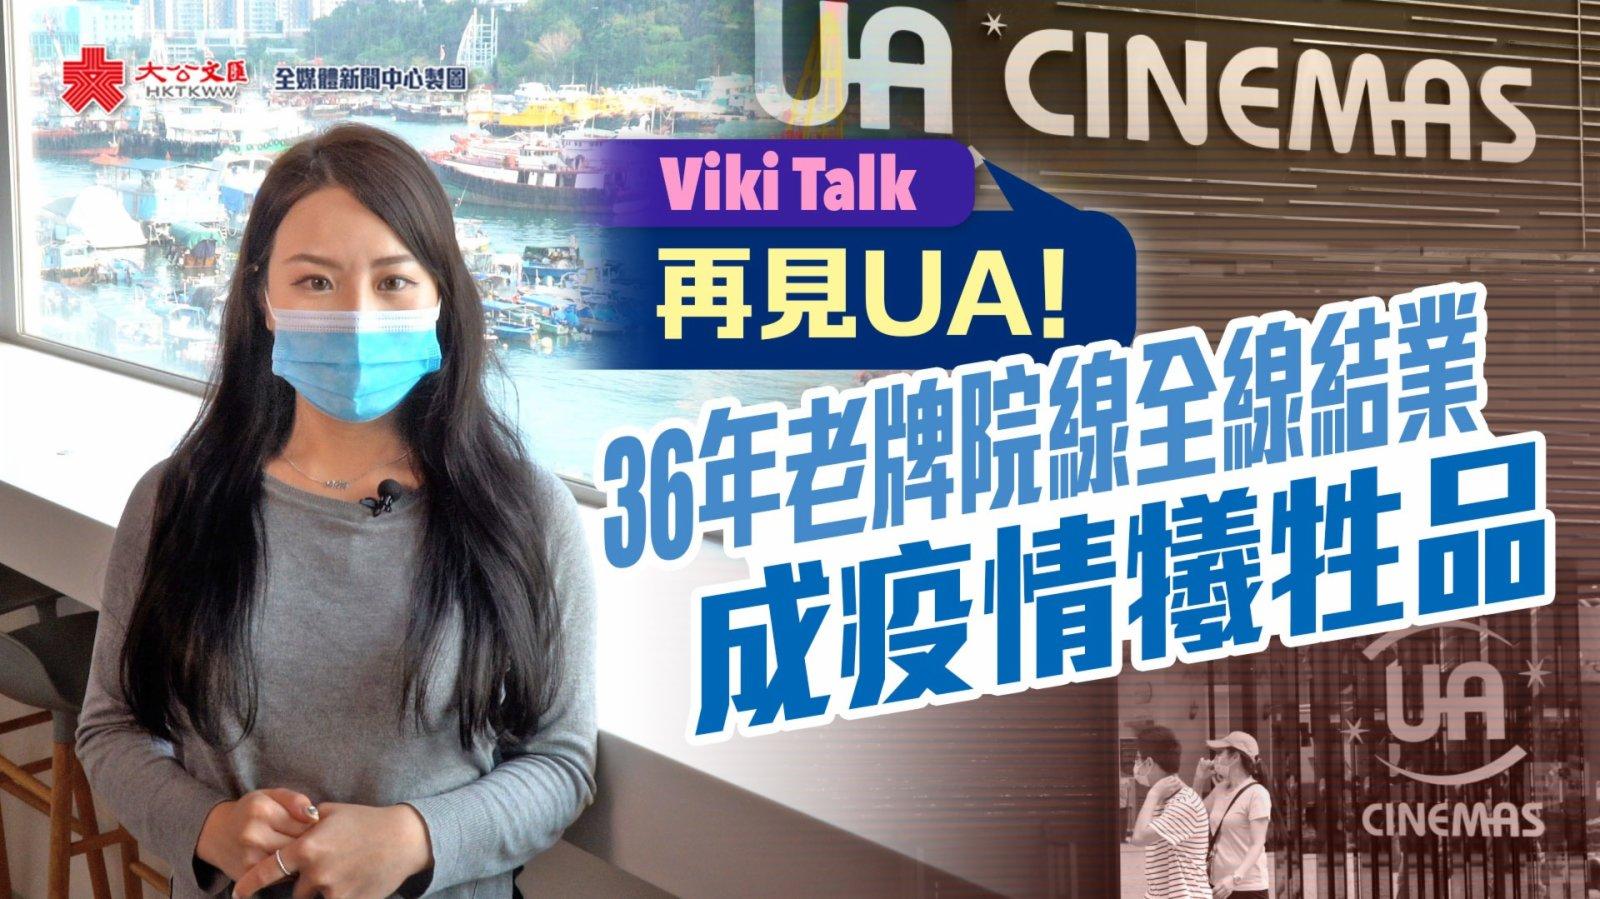 Viki Talk|再見UA! 36年老牌院線全線結業成疫情犧牲品